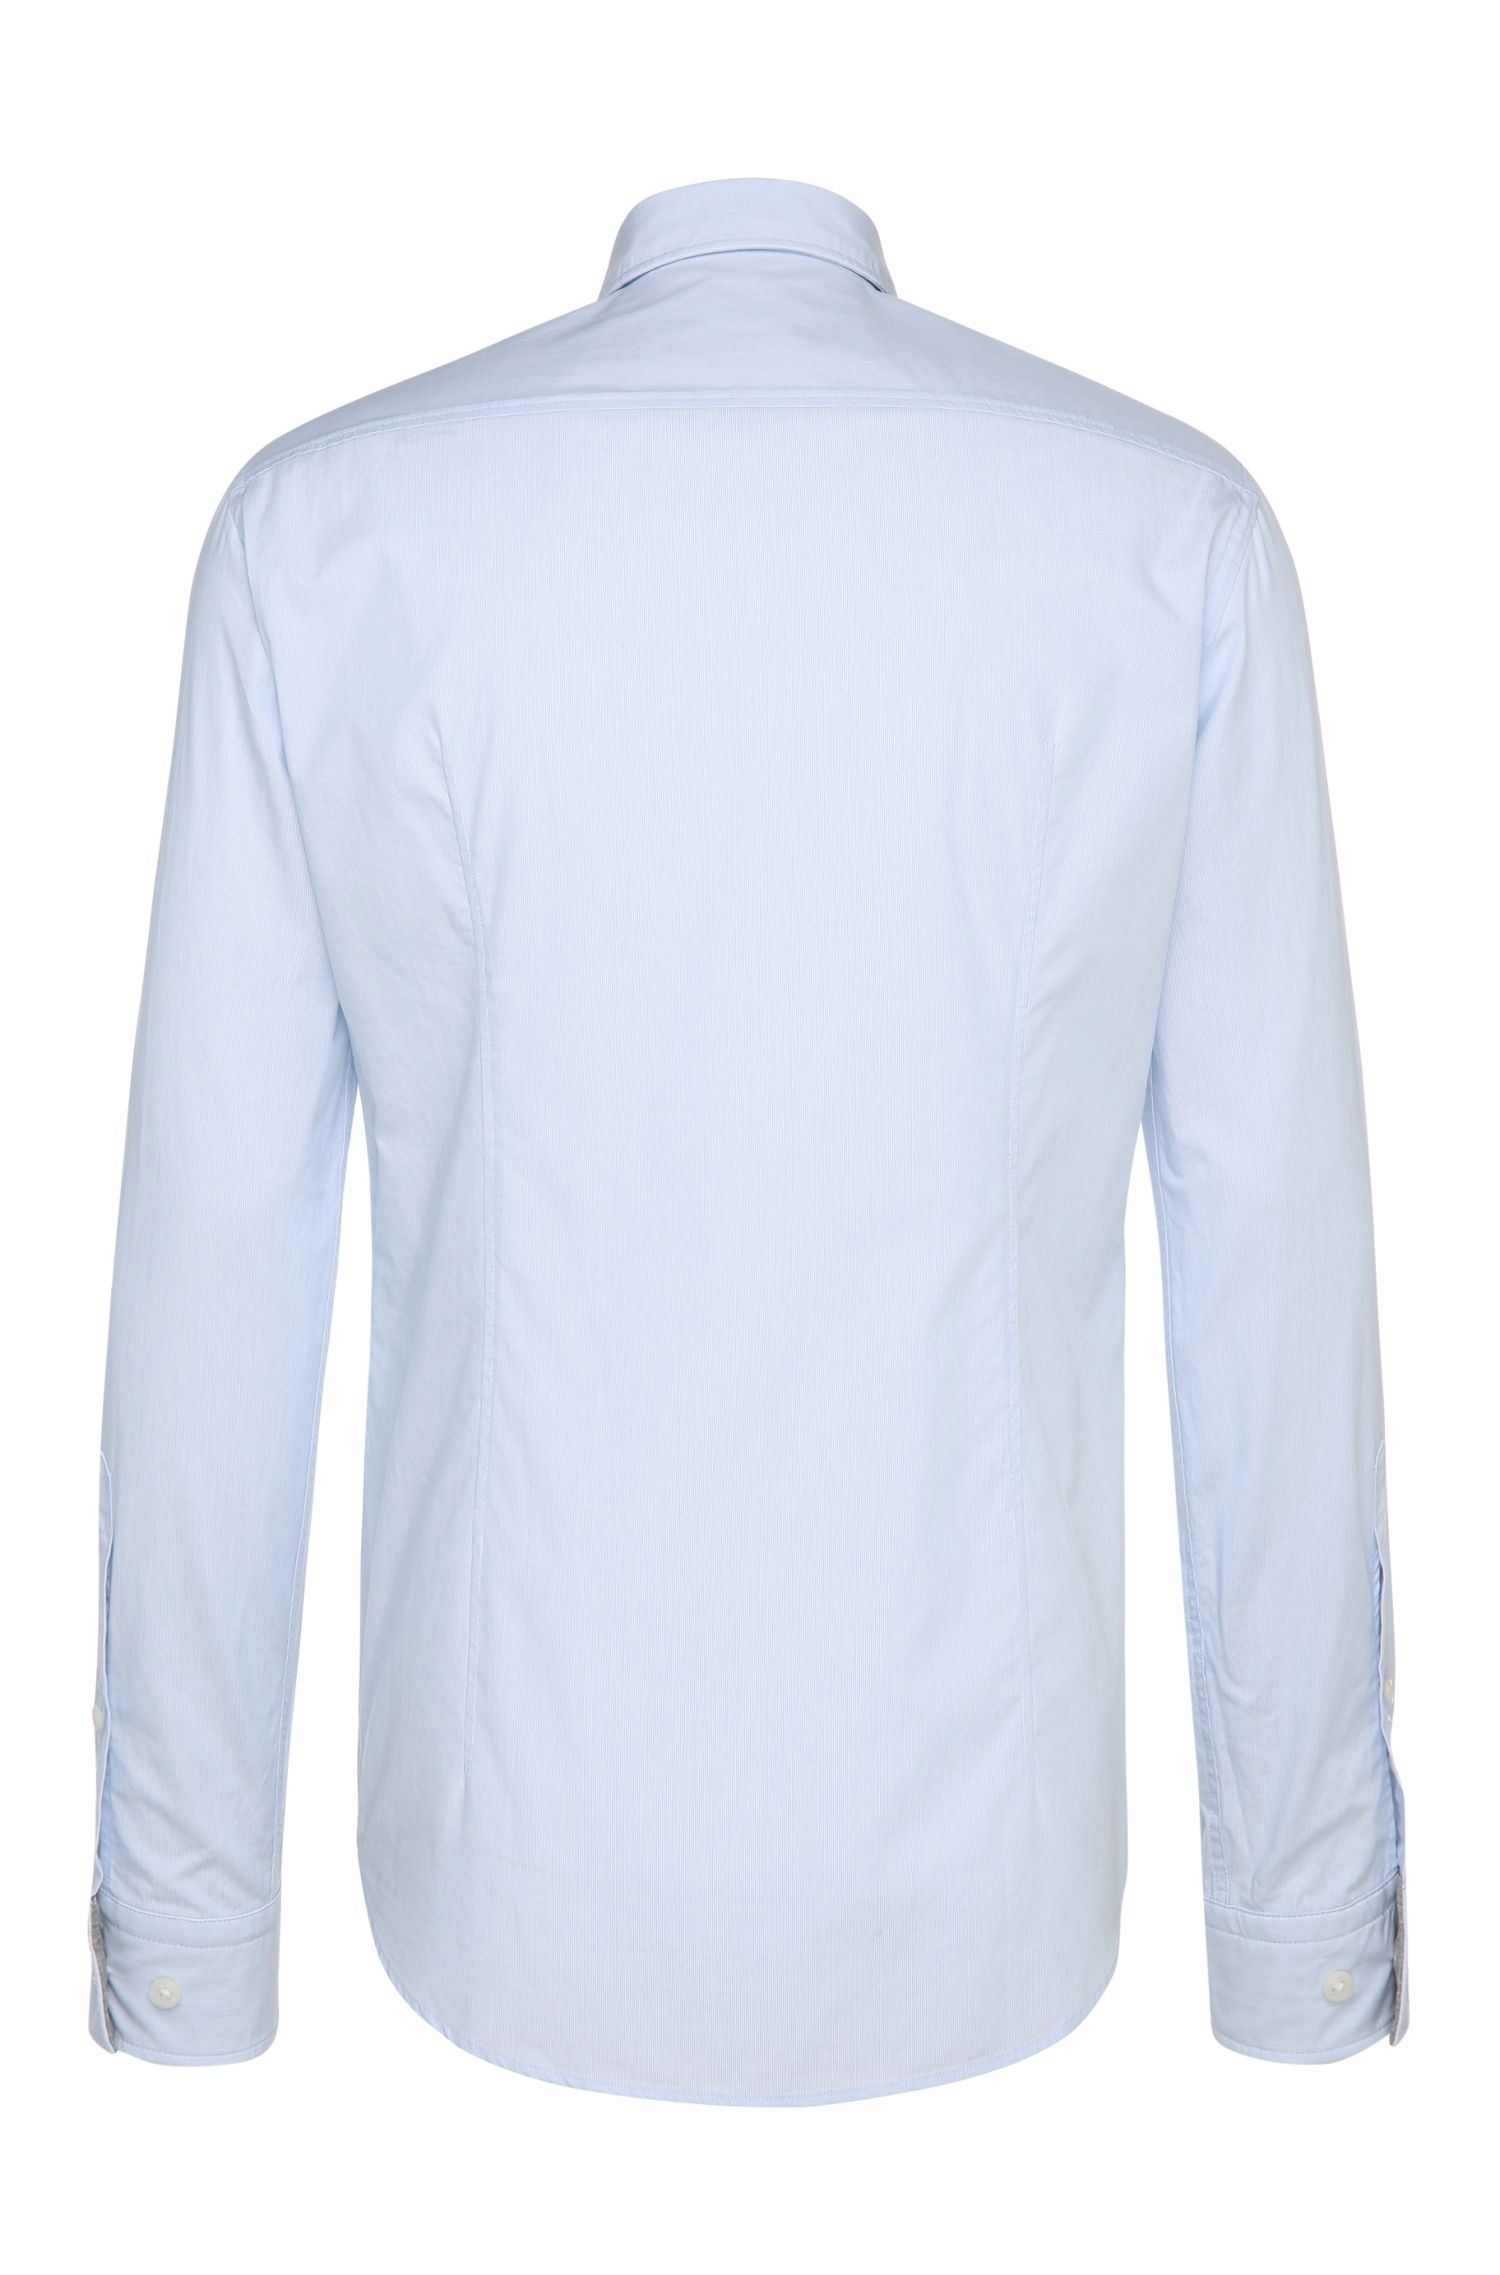 Regular-Fit Hemd aus texturierter Baumwolle: ´C-Buster`